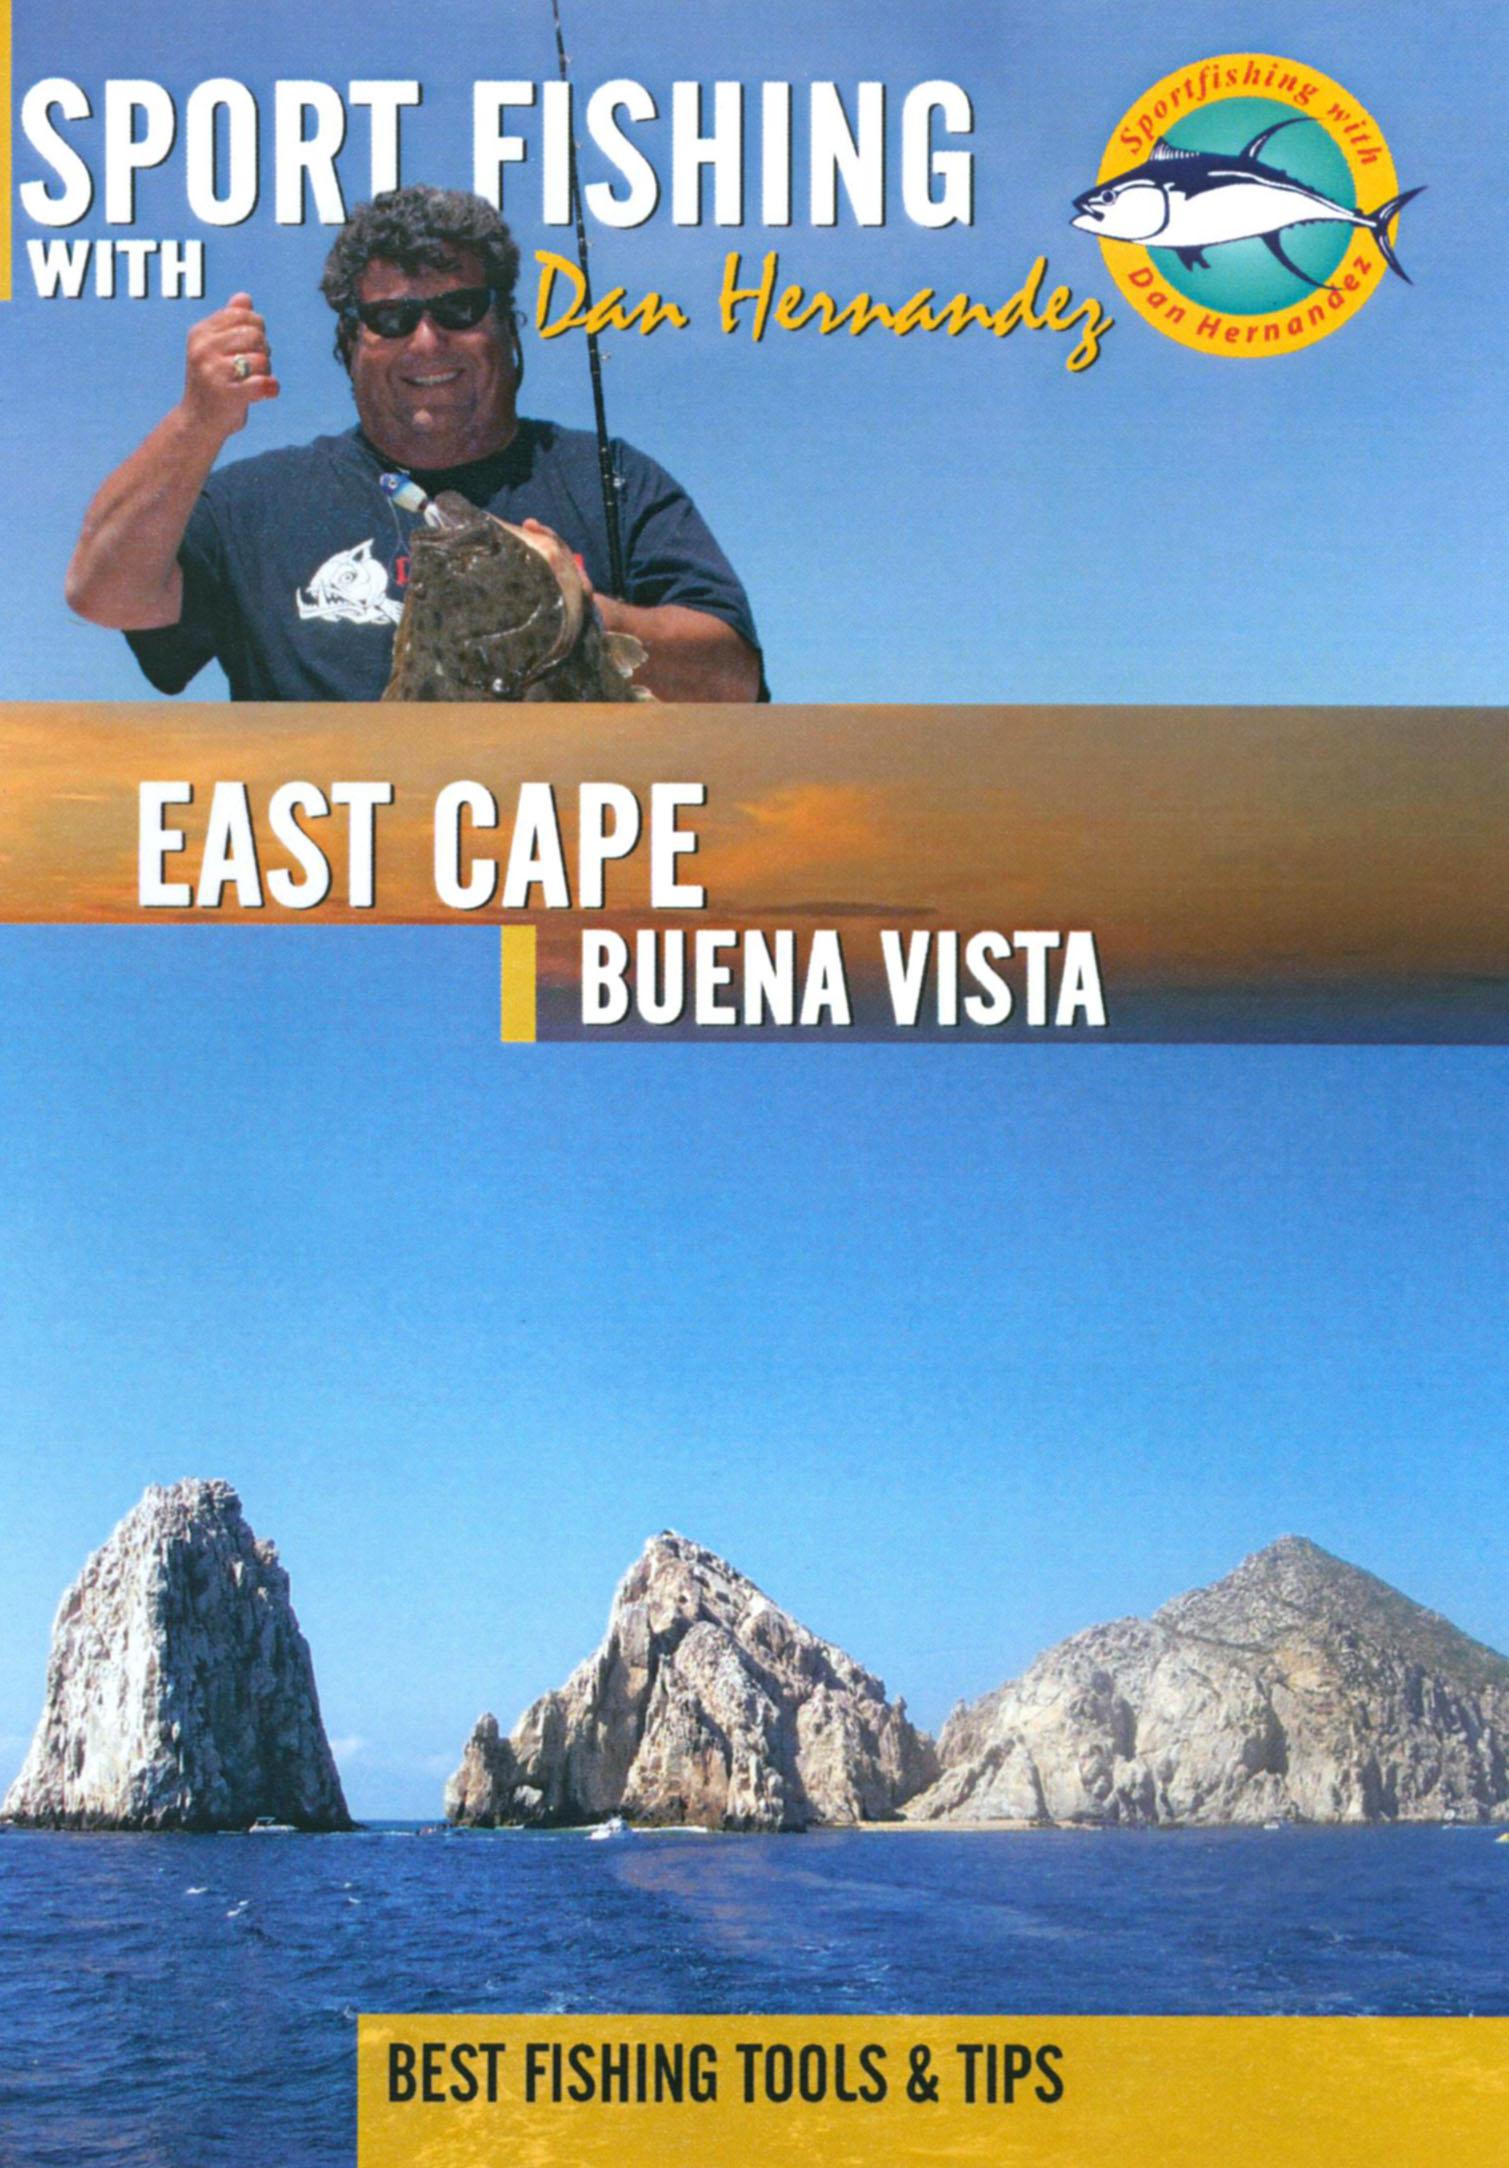 Sport Fishing With Dan Hernandez East Cape Buena Vista